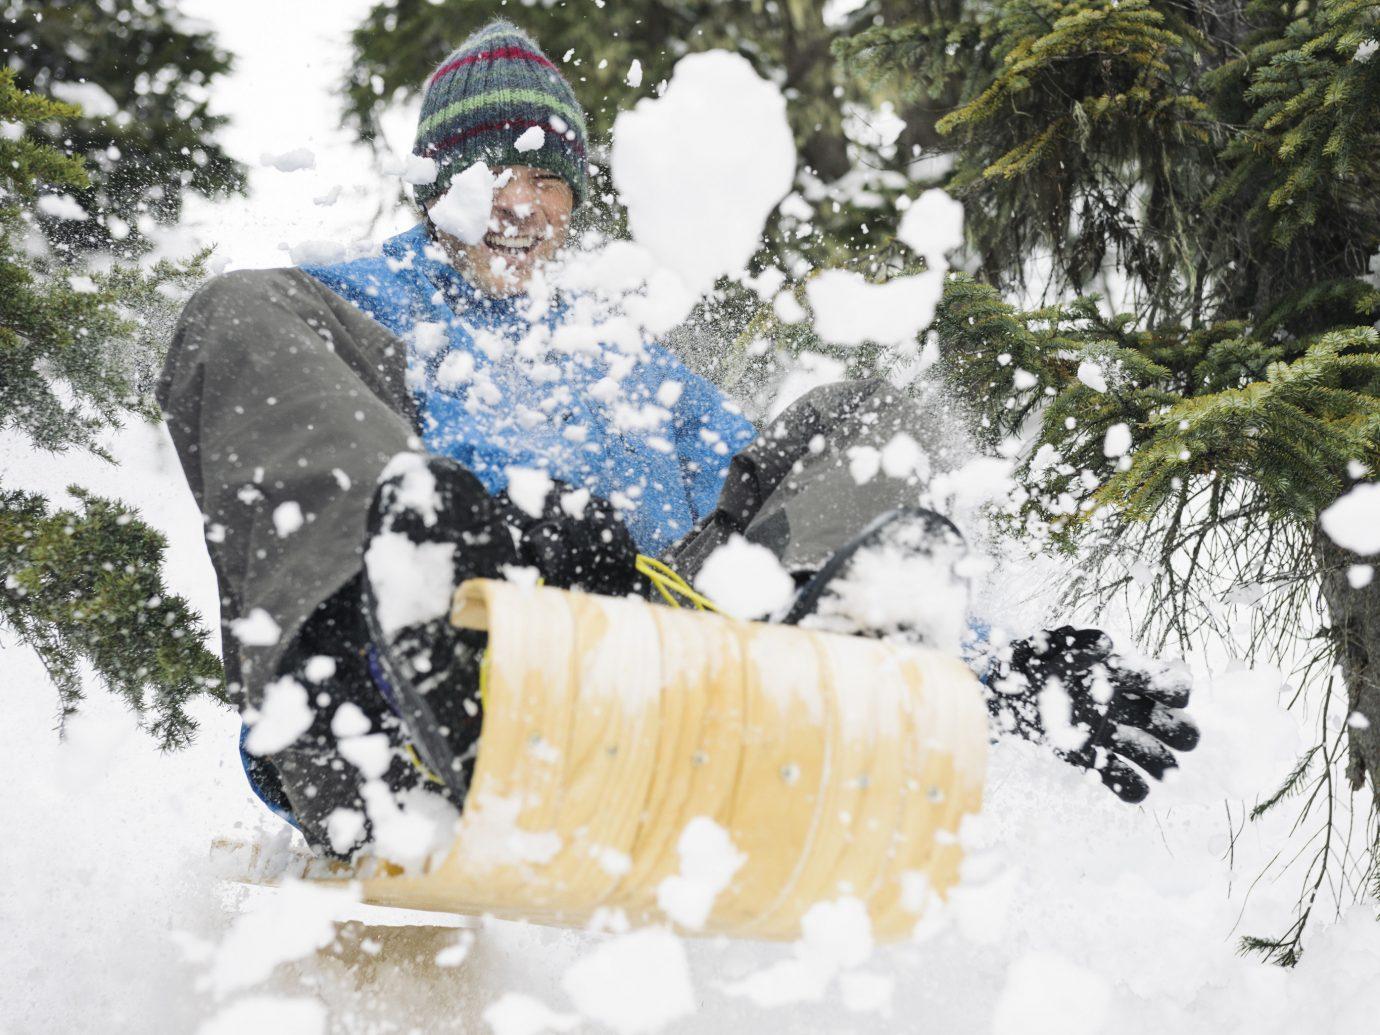 Trip Ideas tree snow outdoor person weather Winter season snowboard footwear extreme sport vehicle snowshoe